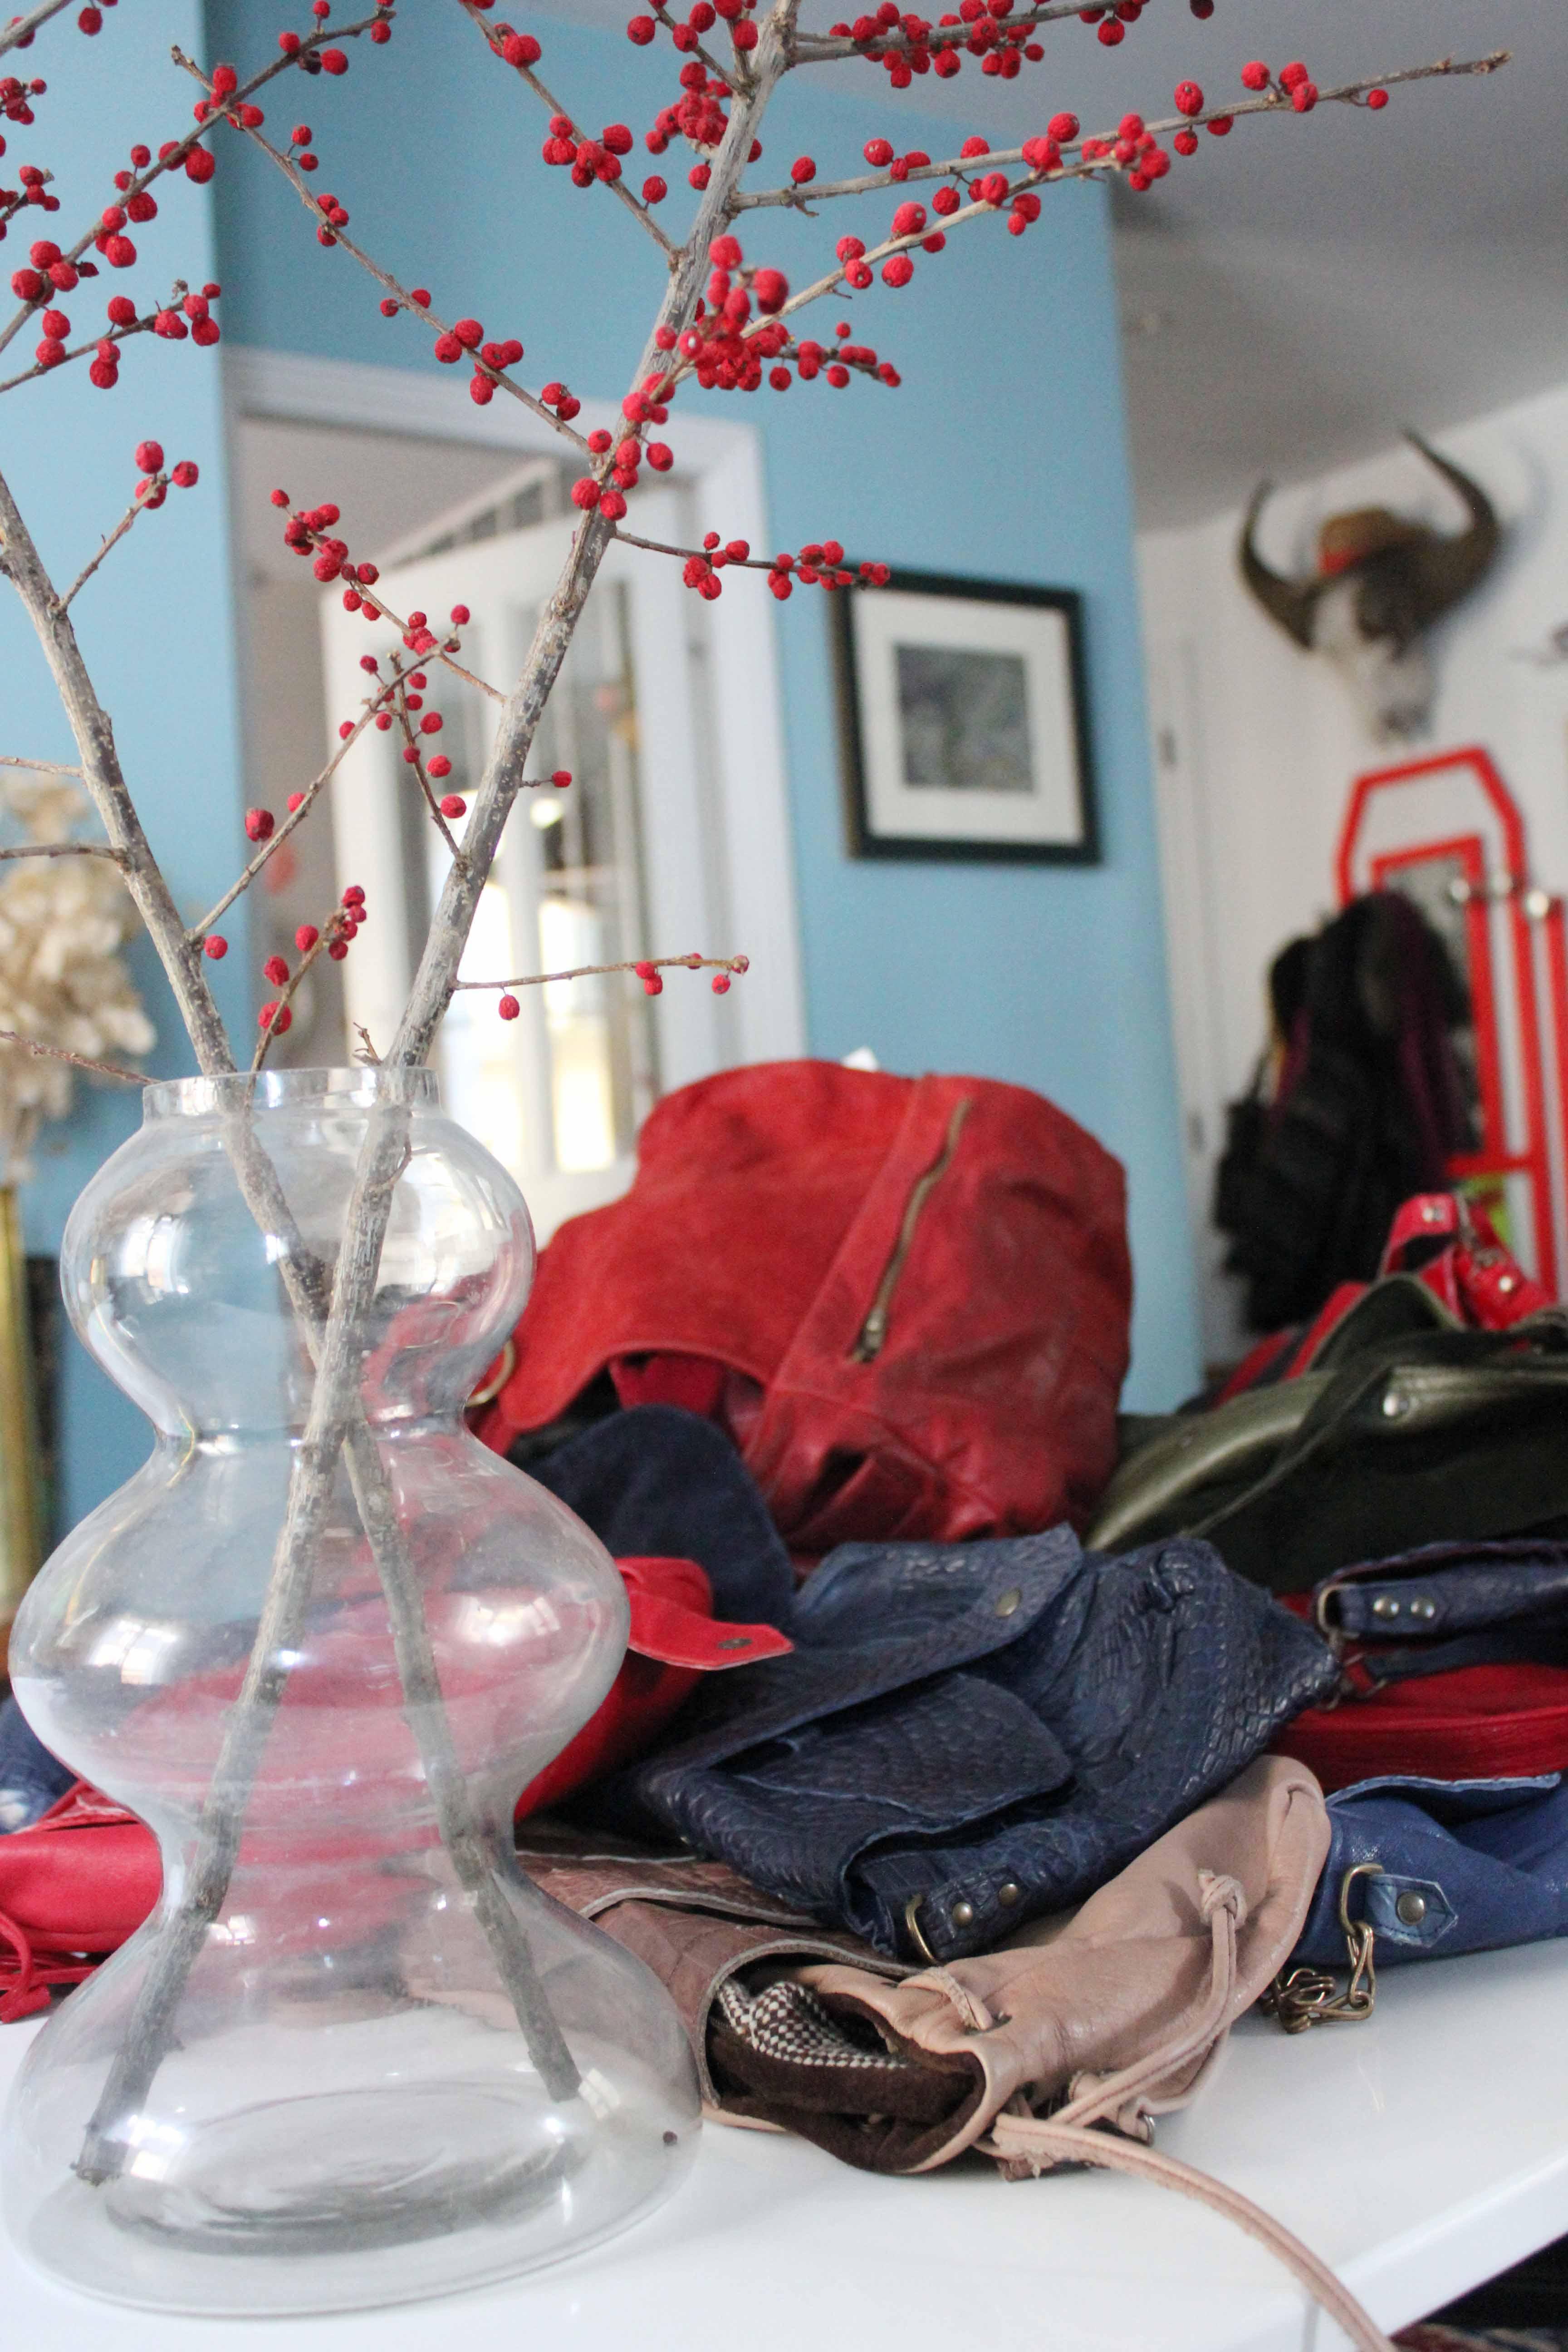 abeas corpus guilty of talent plombier croco bordeaux. Black Bedroom Furniture Sets. Home Design Ideas